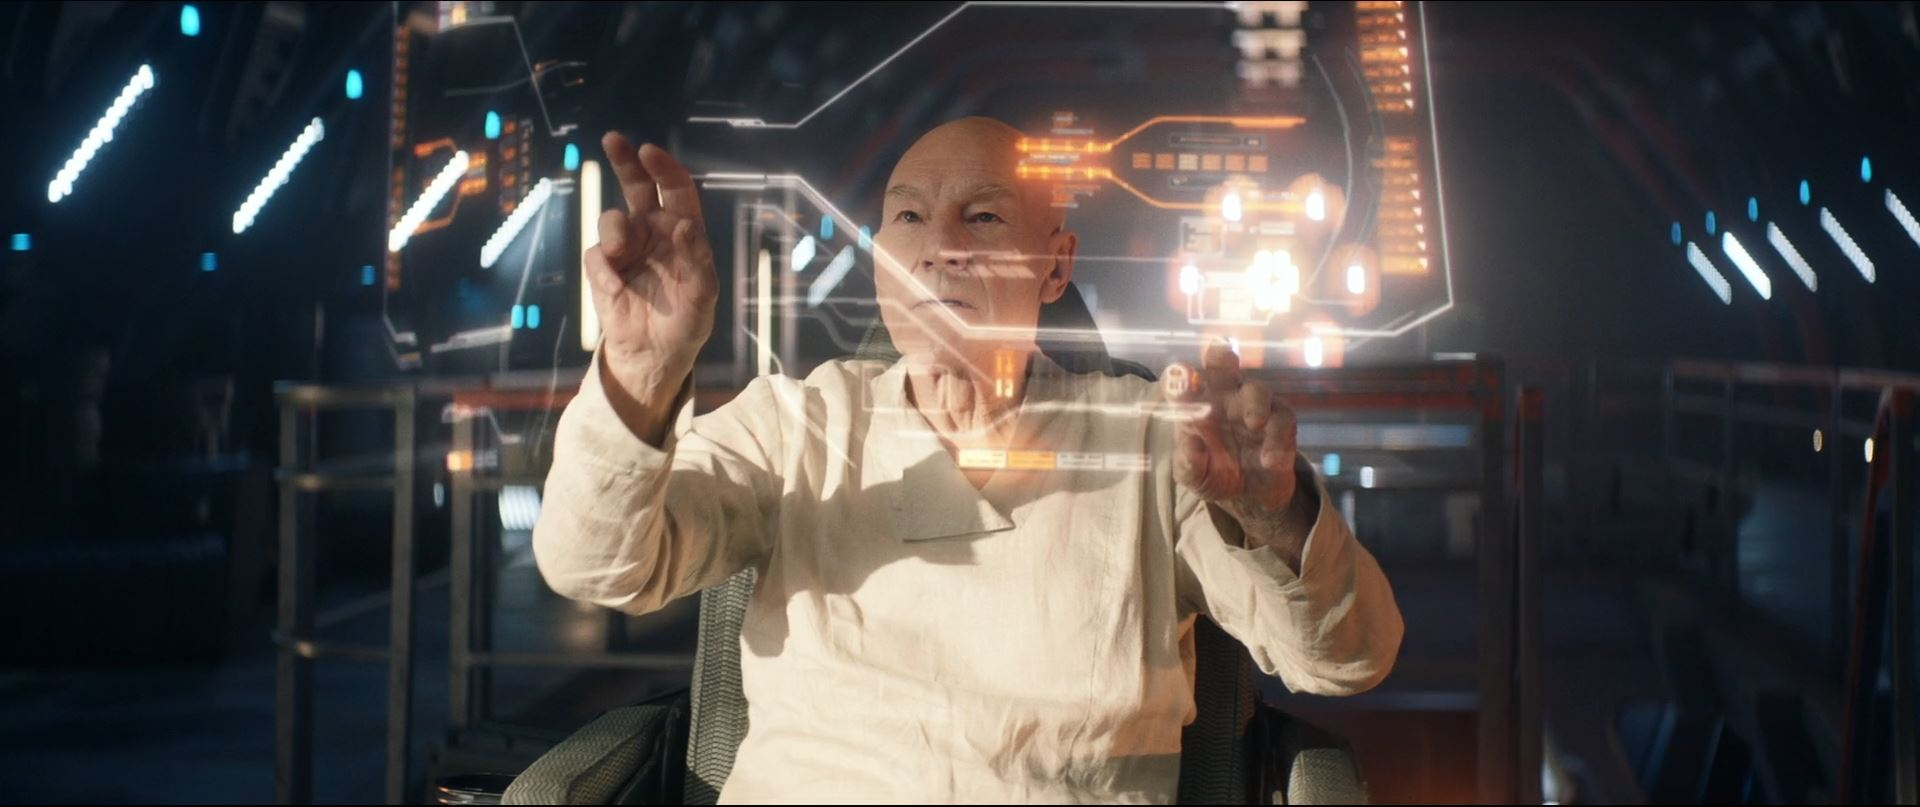 Star Trek Picard S01E10 Et in Arcadia Ego Part 2 Review - Picard commands La Sirena